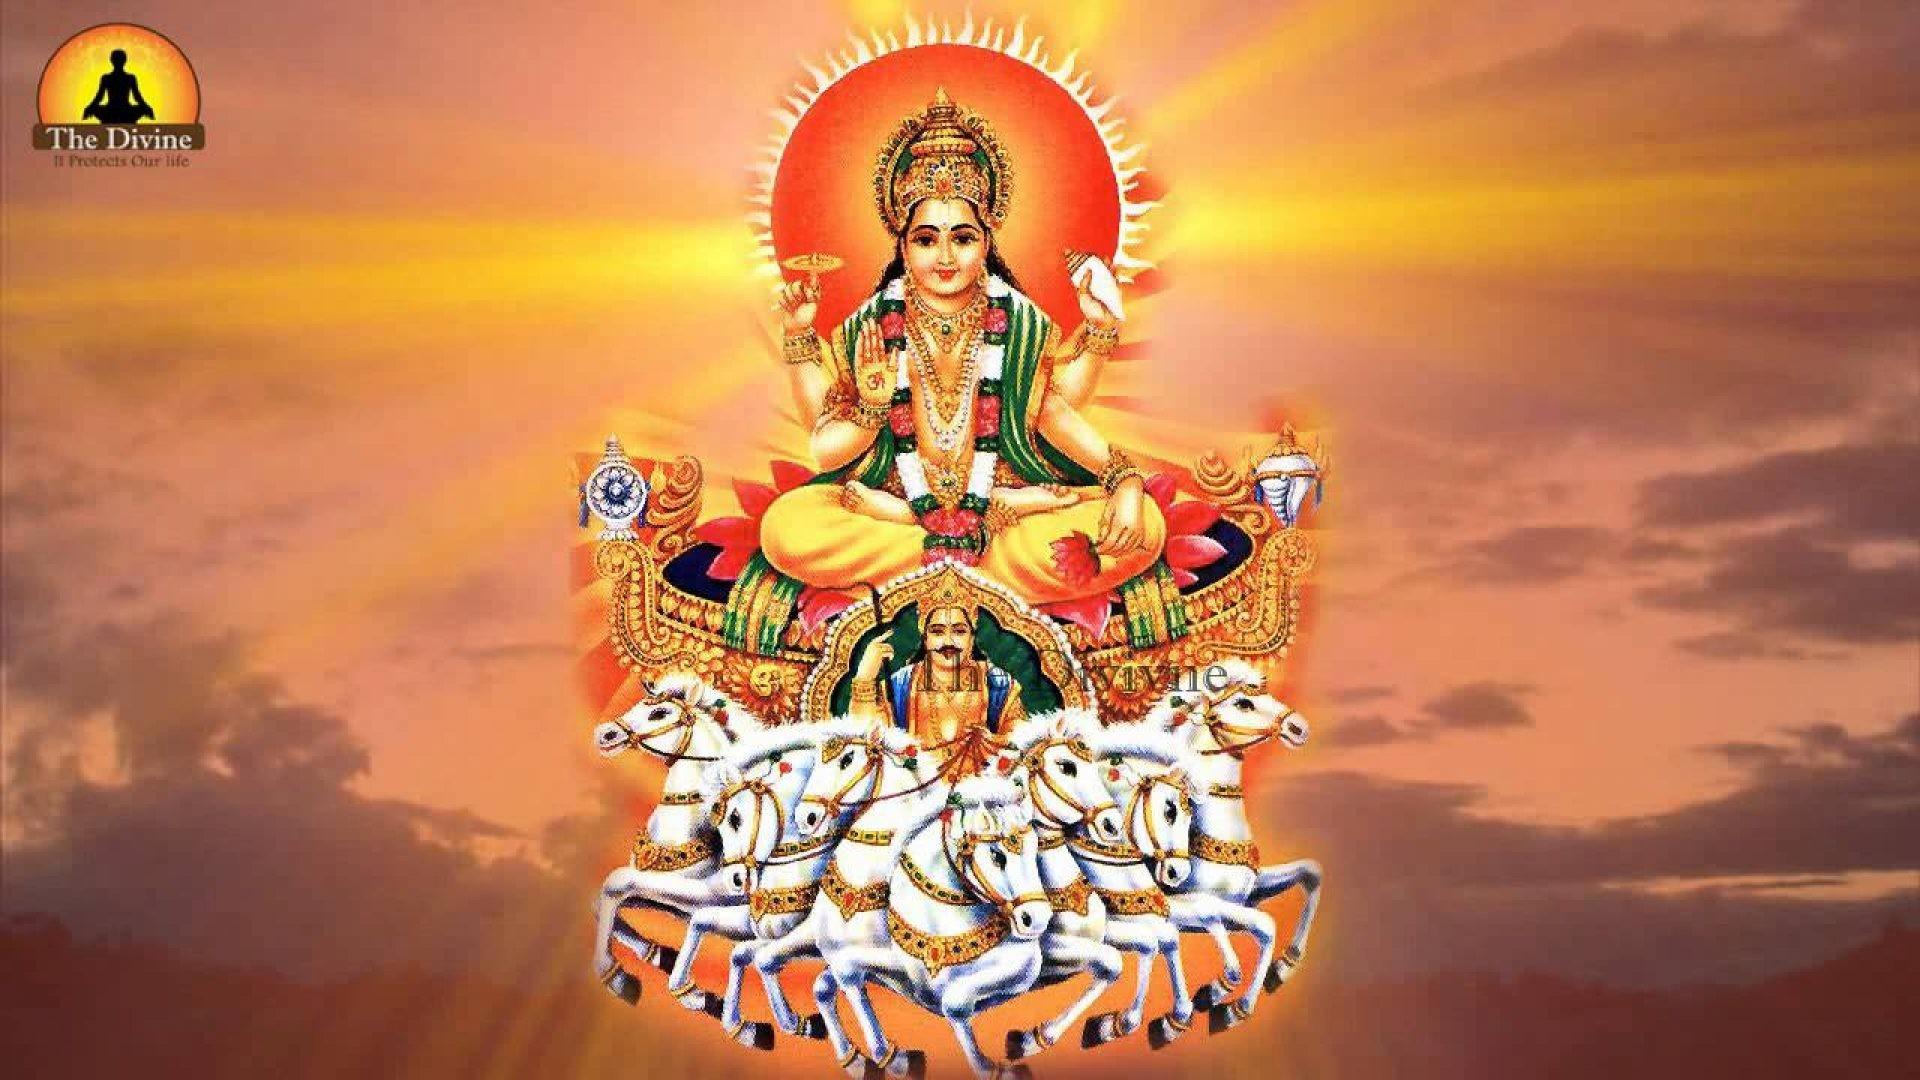 Latest Indian God Sun Wallpaper   Data-src - Chhath Puja God - HD Wallpaper